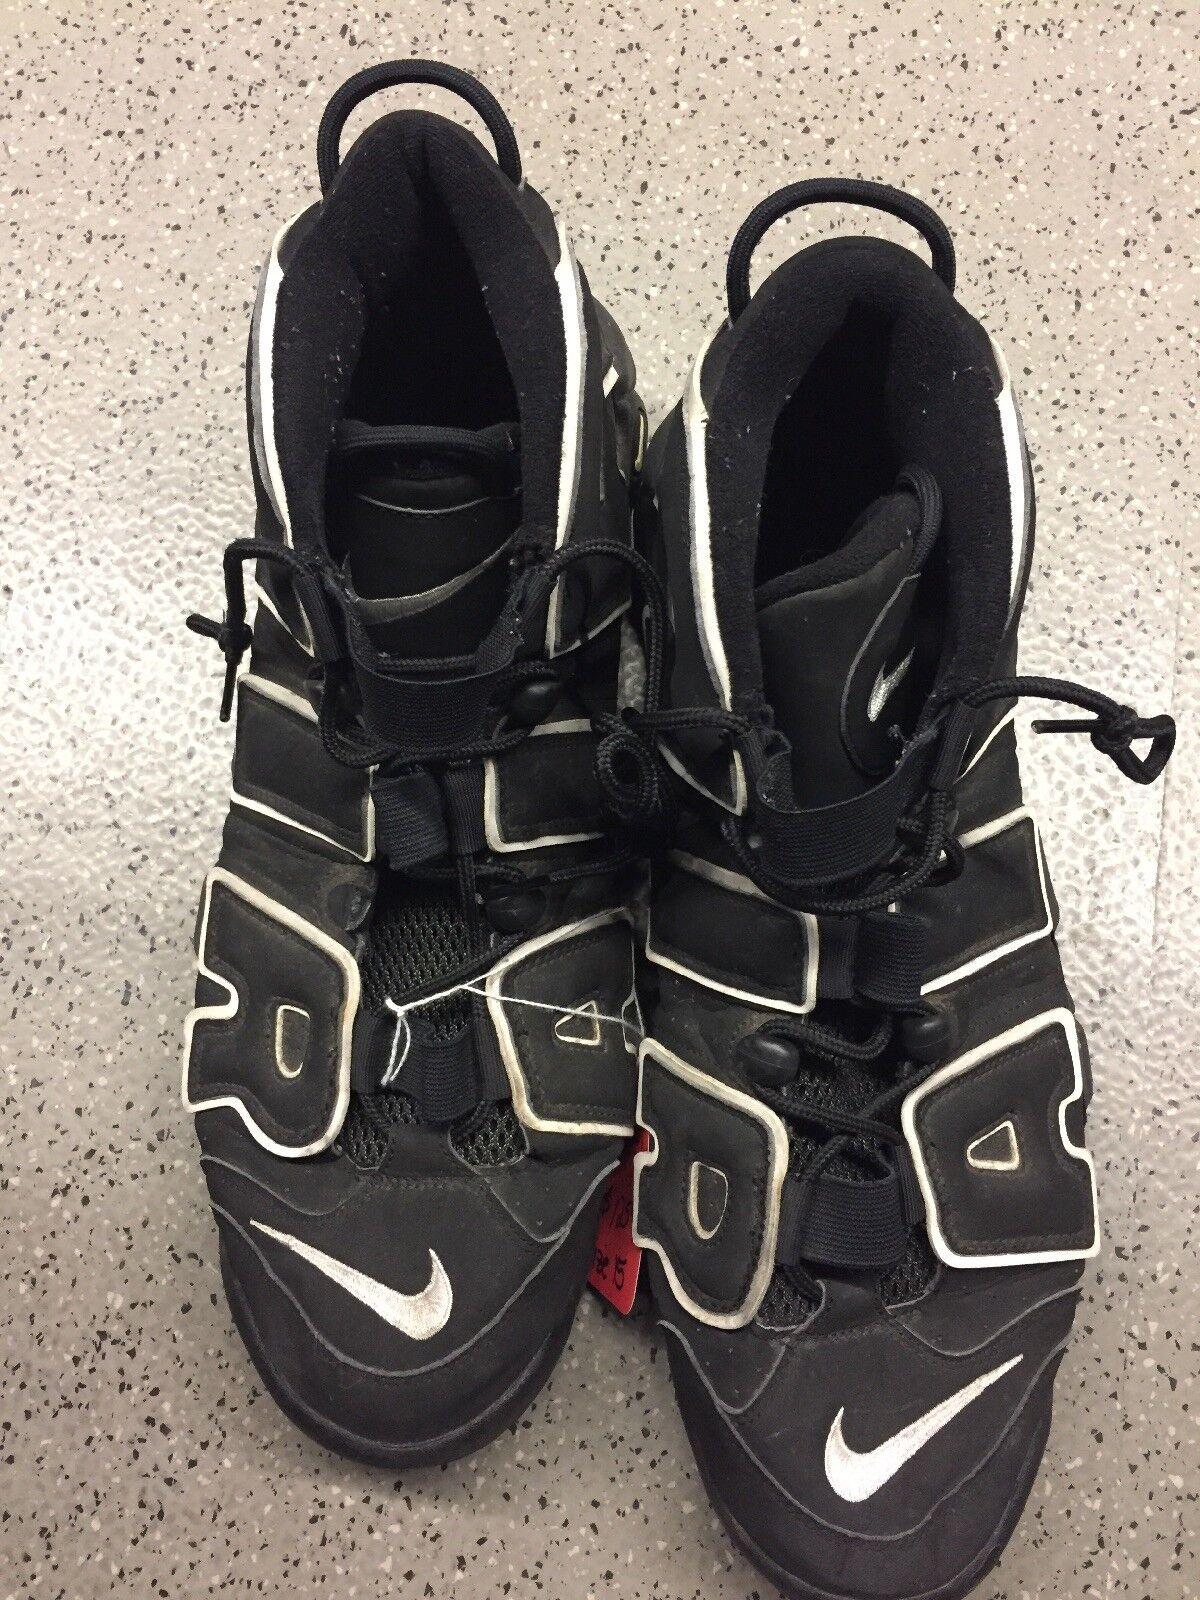 Nike Air Jordan 2010 Size 15.   414862-001